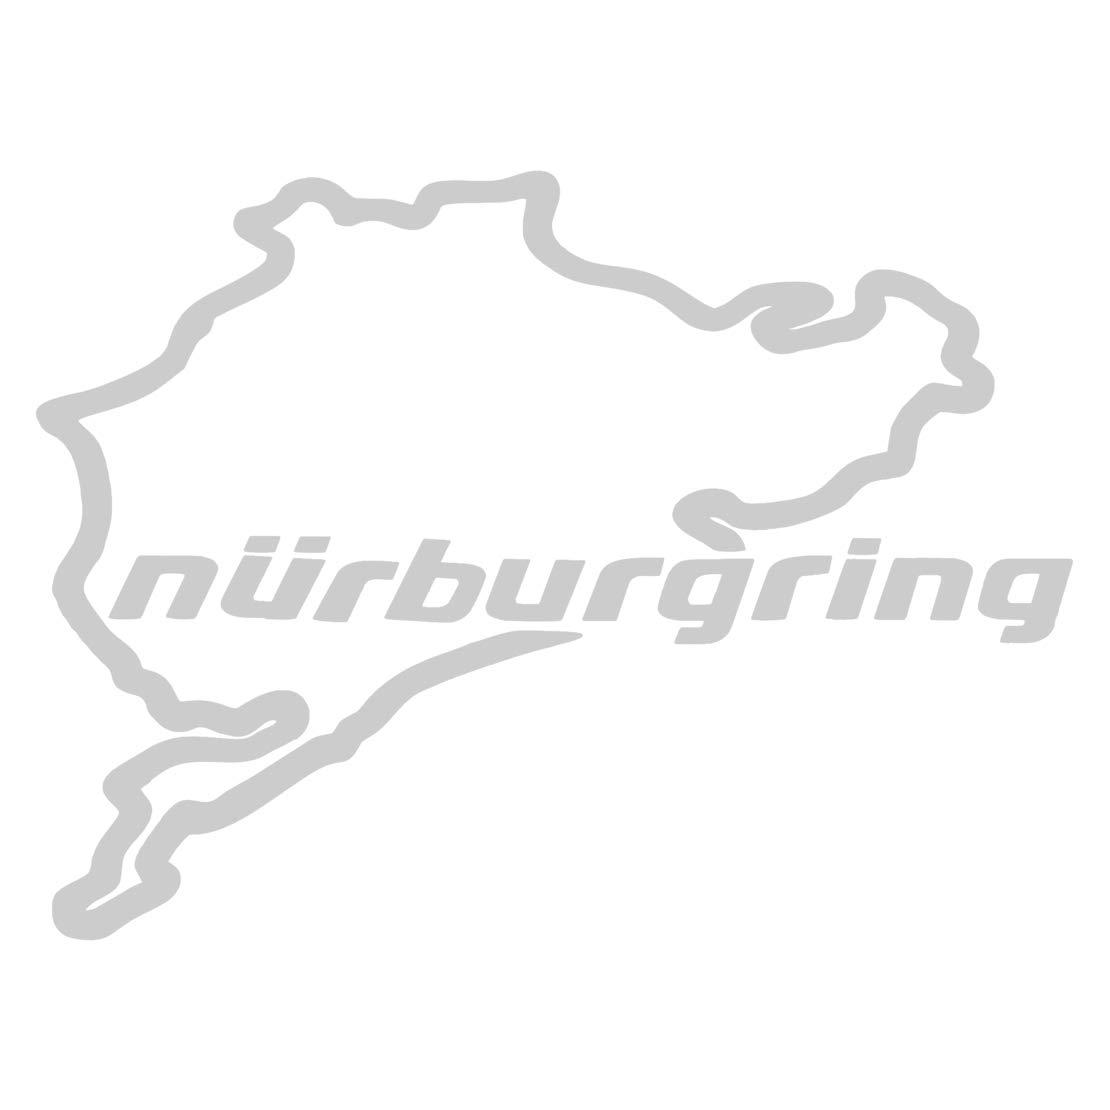 CITALL Vinyl Racing N/ürburgring Autoaufkleber Aufkleber Aufkleber Umriss f/ür Fensterwand Laptop